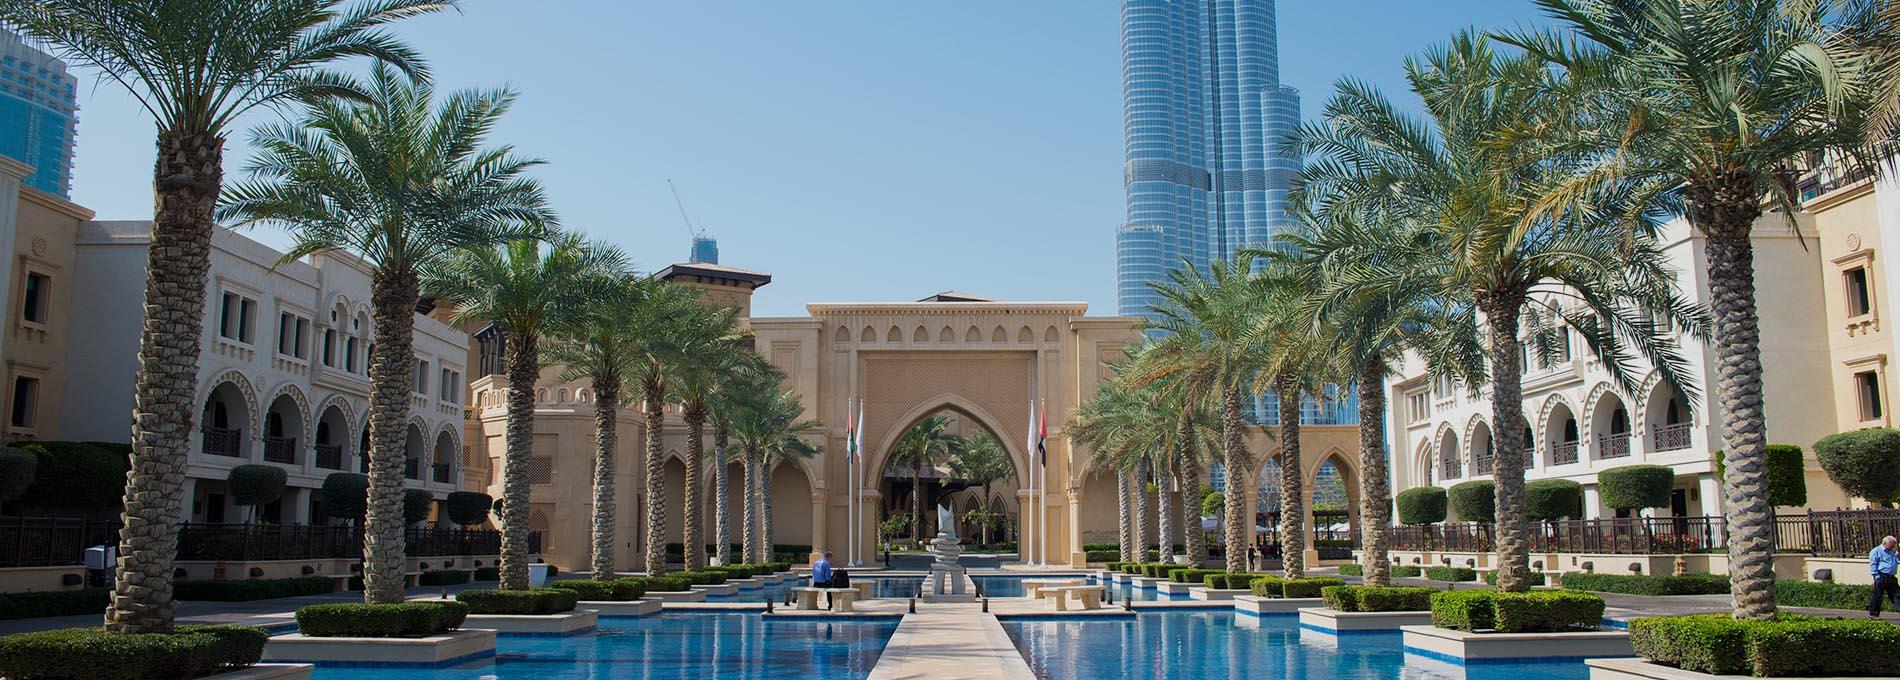 Intellectual Property Law Firms In Dubai   Corporate Law